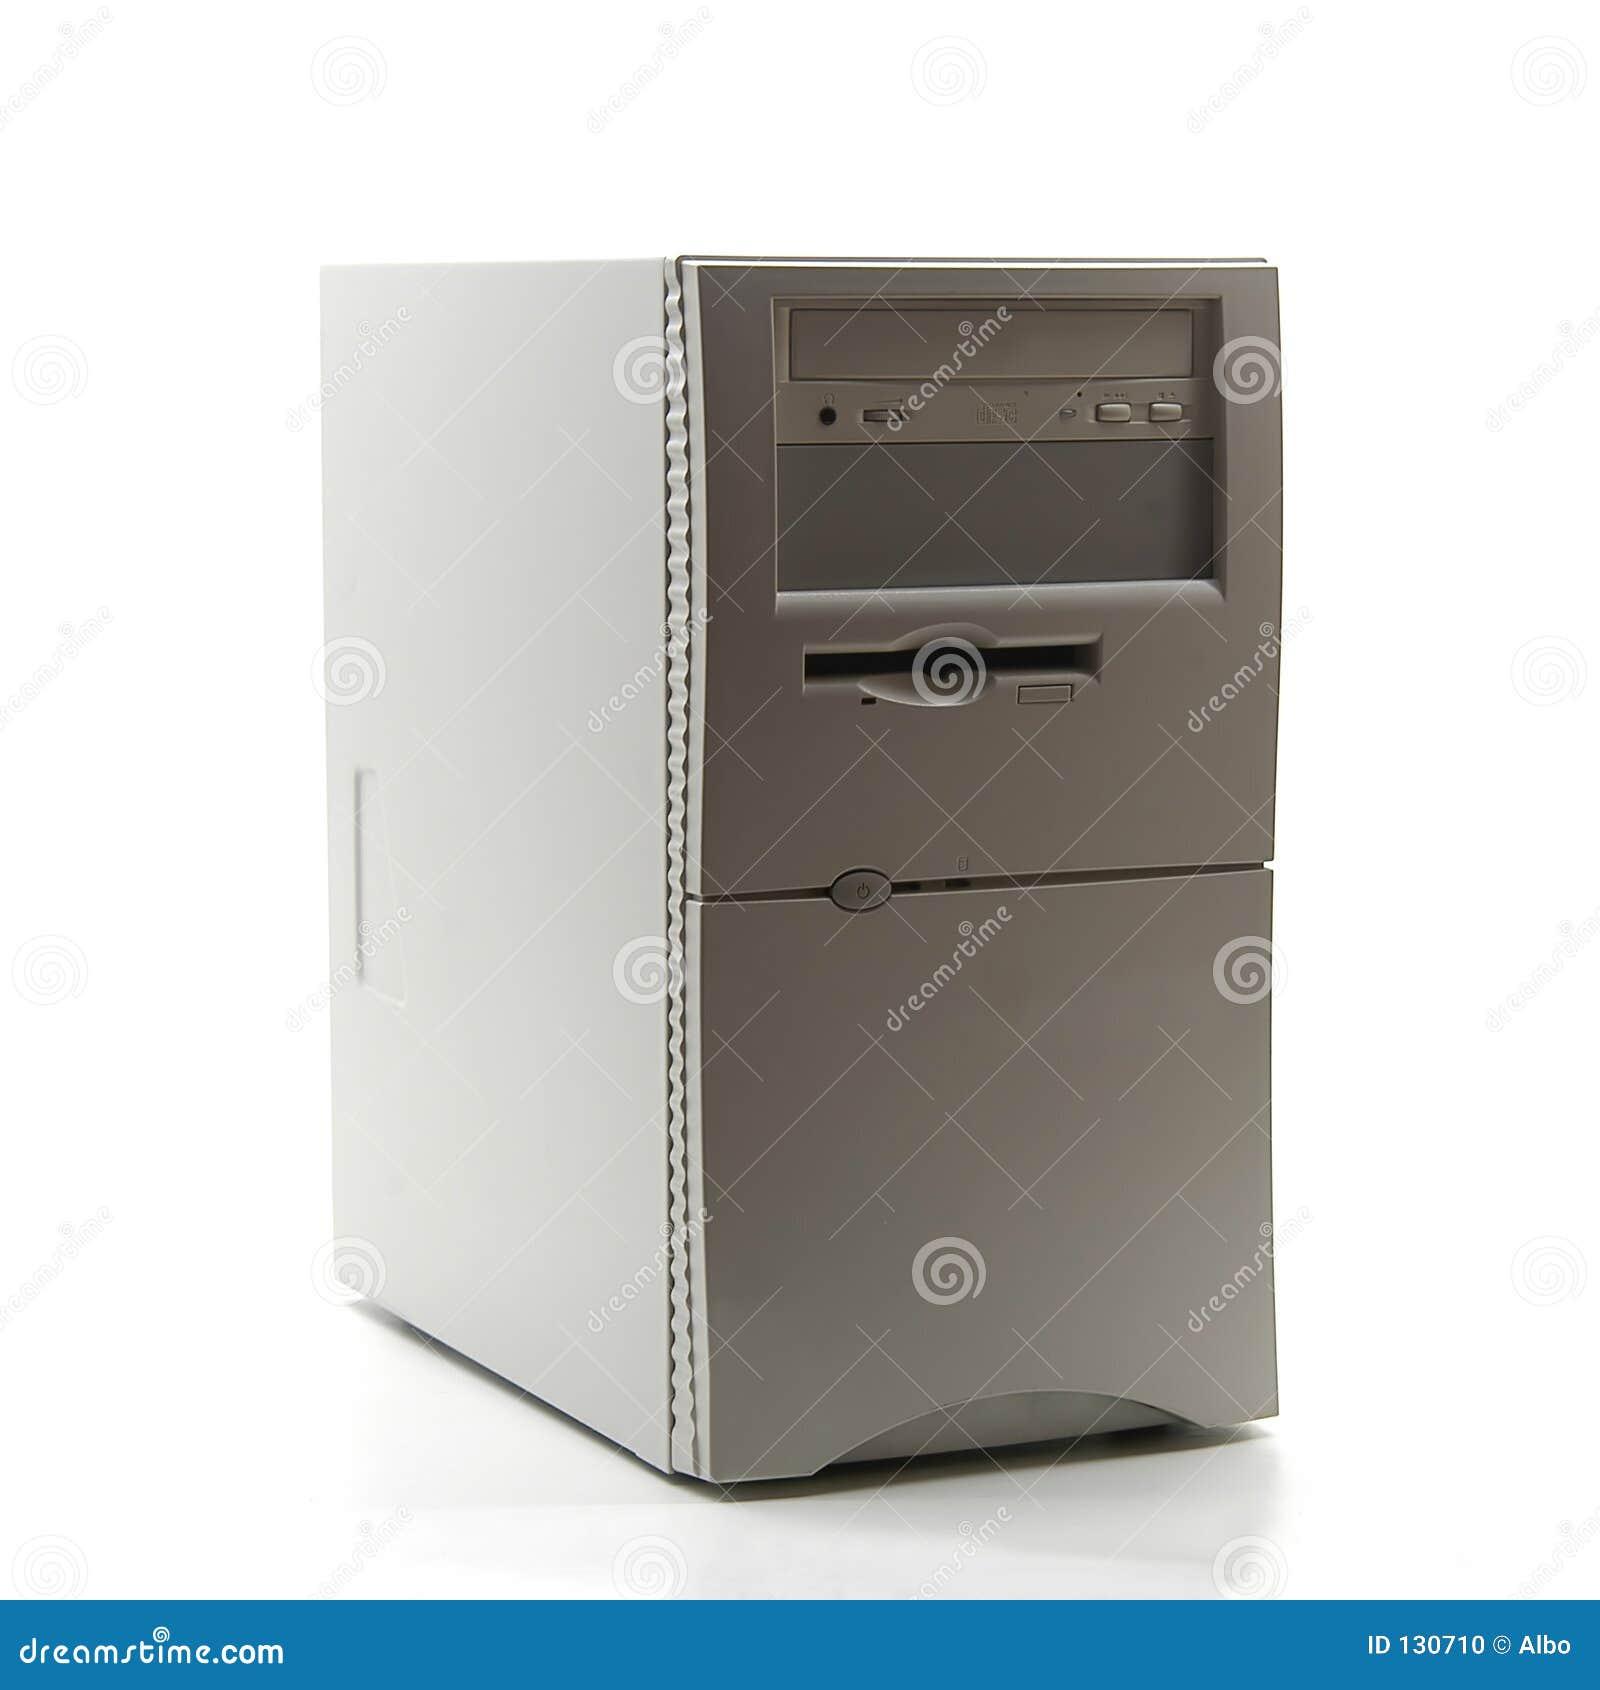 Komputer osobisty mini tower